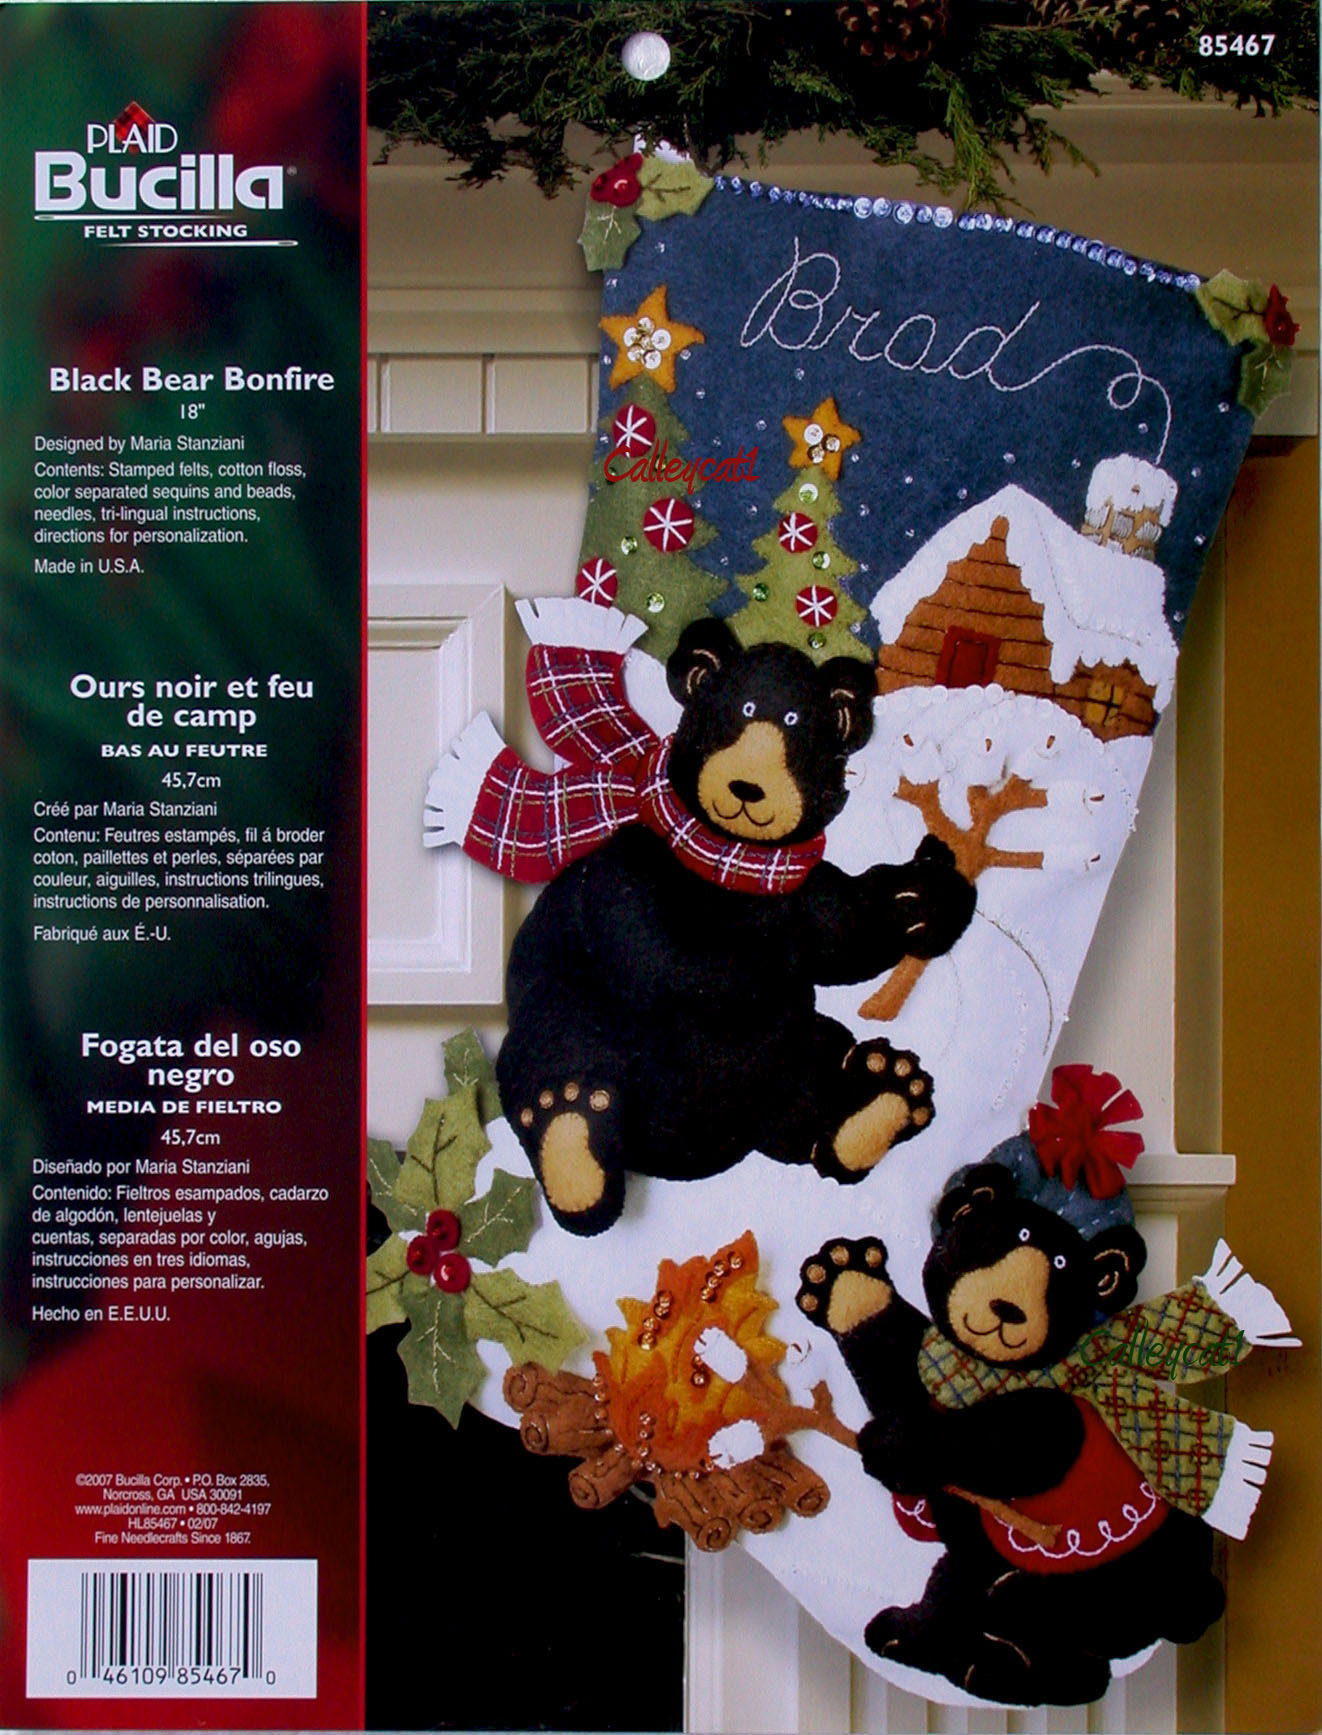 Bear Christmas Stocking.Black Bear Bonfire 18 Bucilla Felt Christmas Stocking Kit 85467